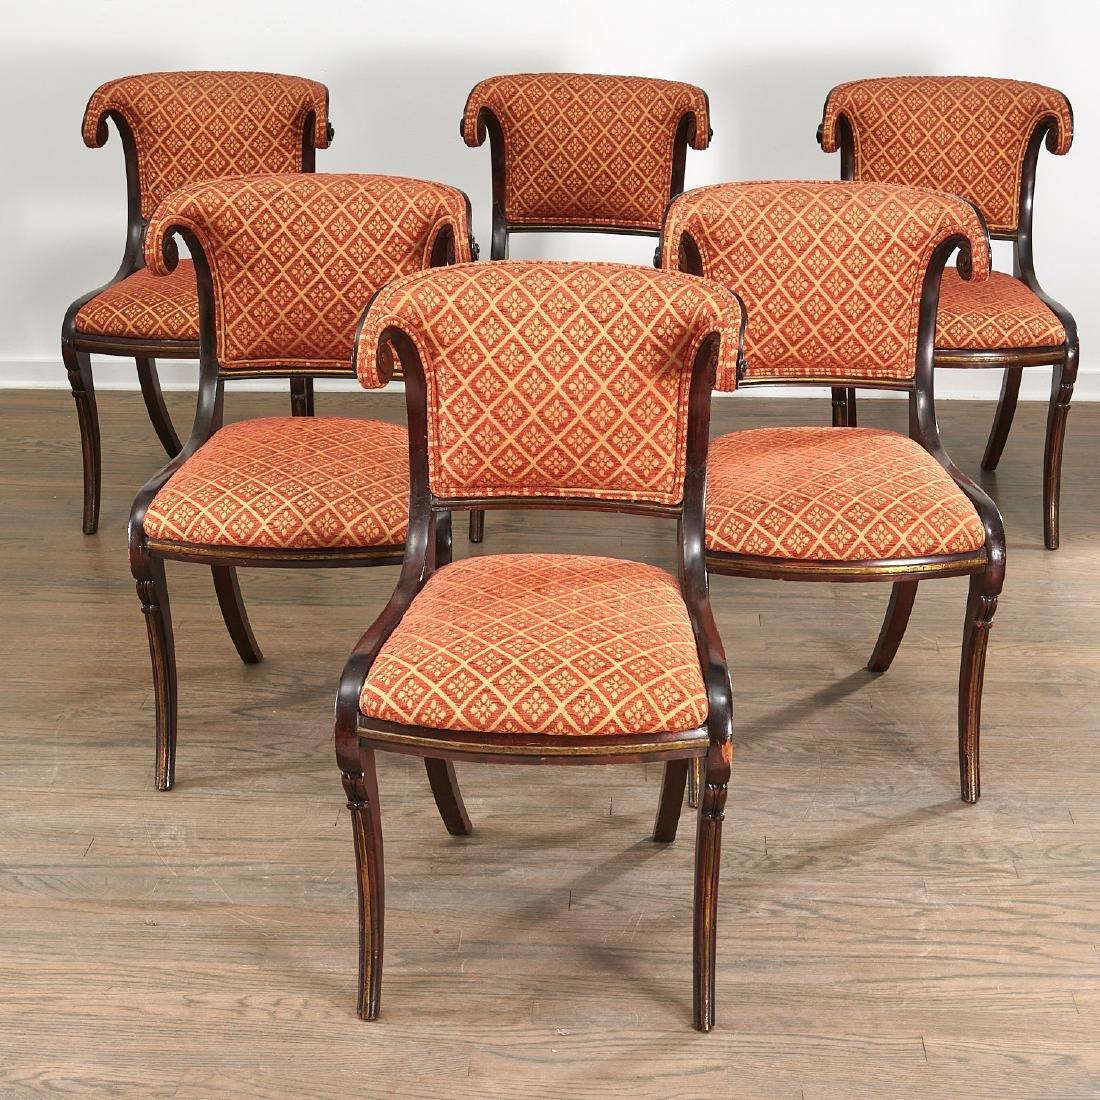 Set (6) Regency style Klismos dining chairs